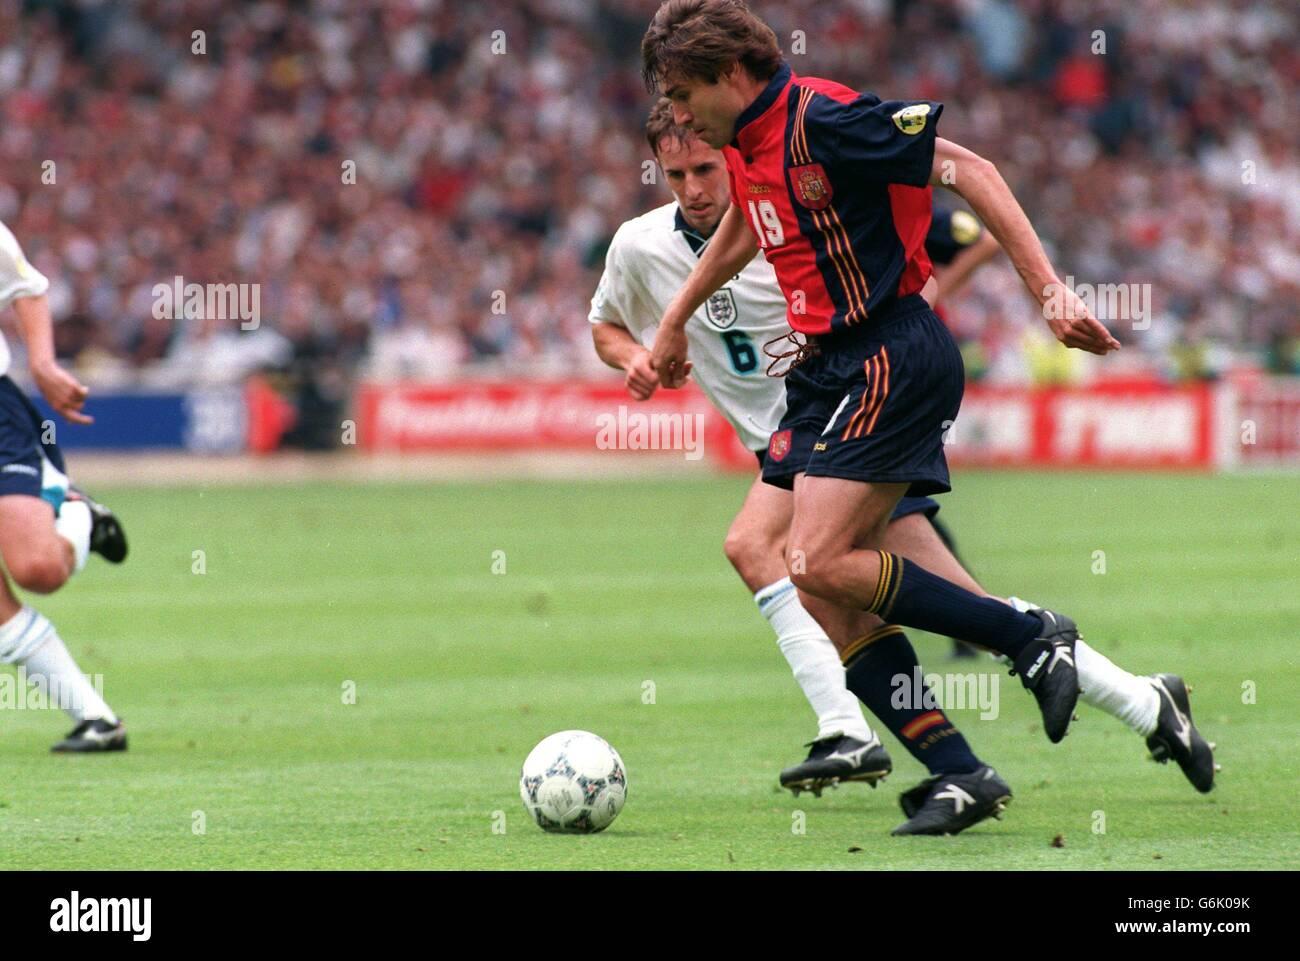 Soccer, Euro 96. England v Spain, Wembley. Julio Salinas, Spain and Gareth Southgate, England Stock Photo